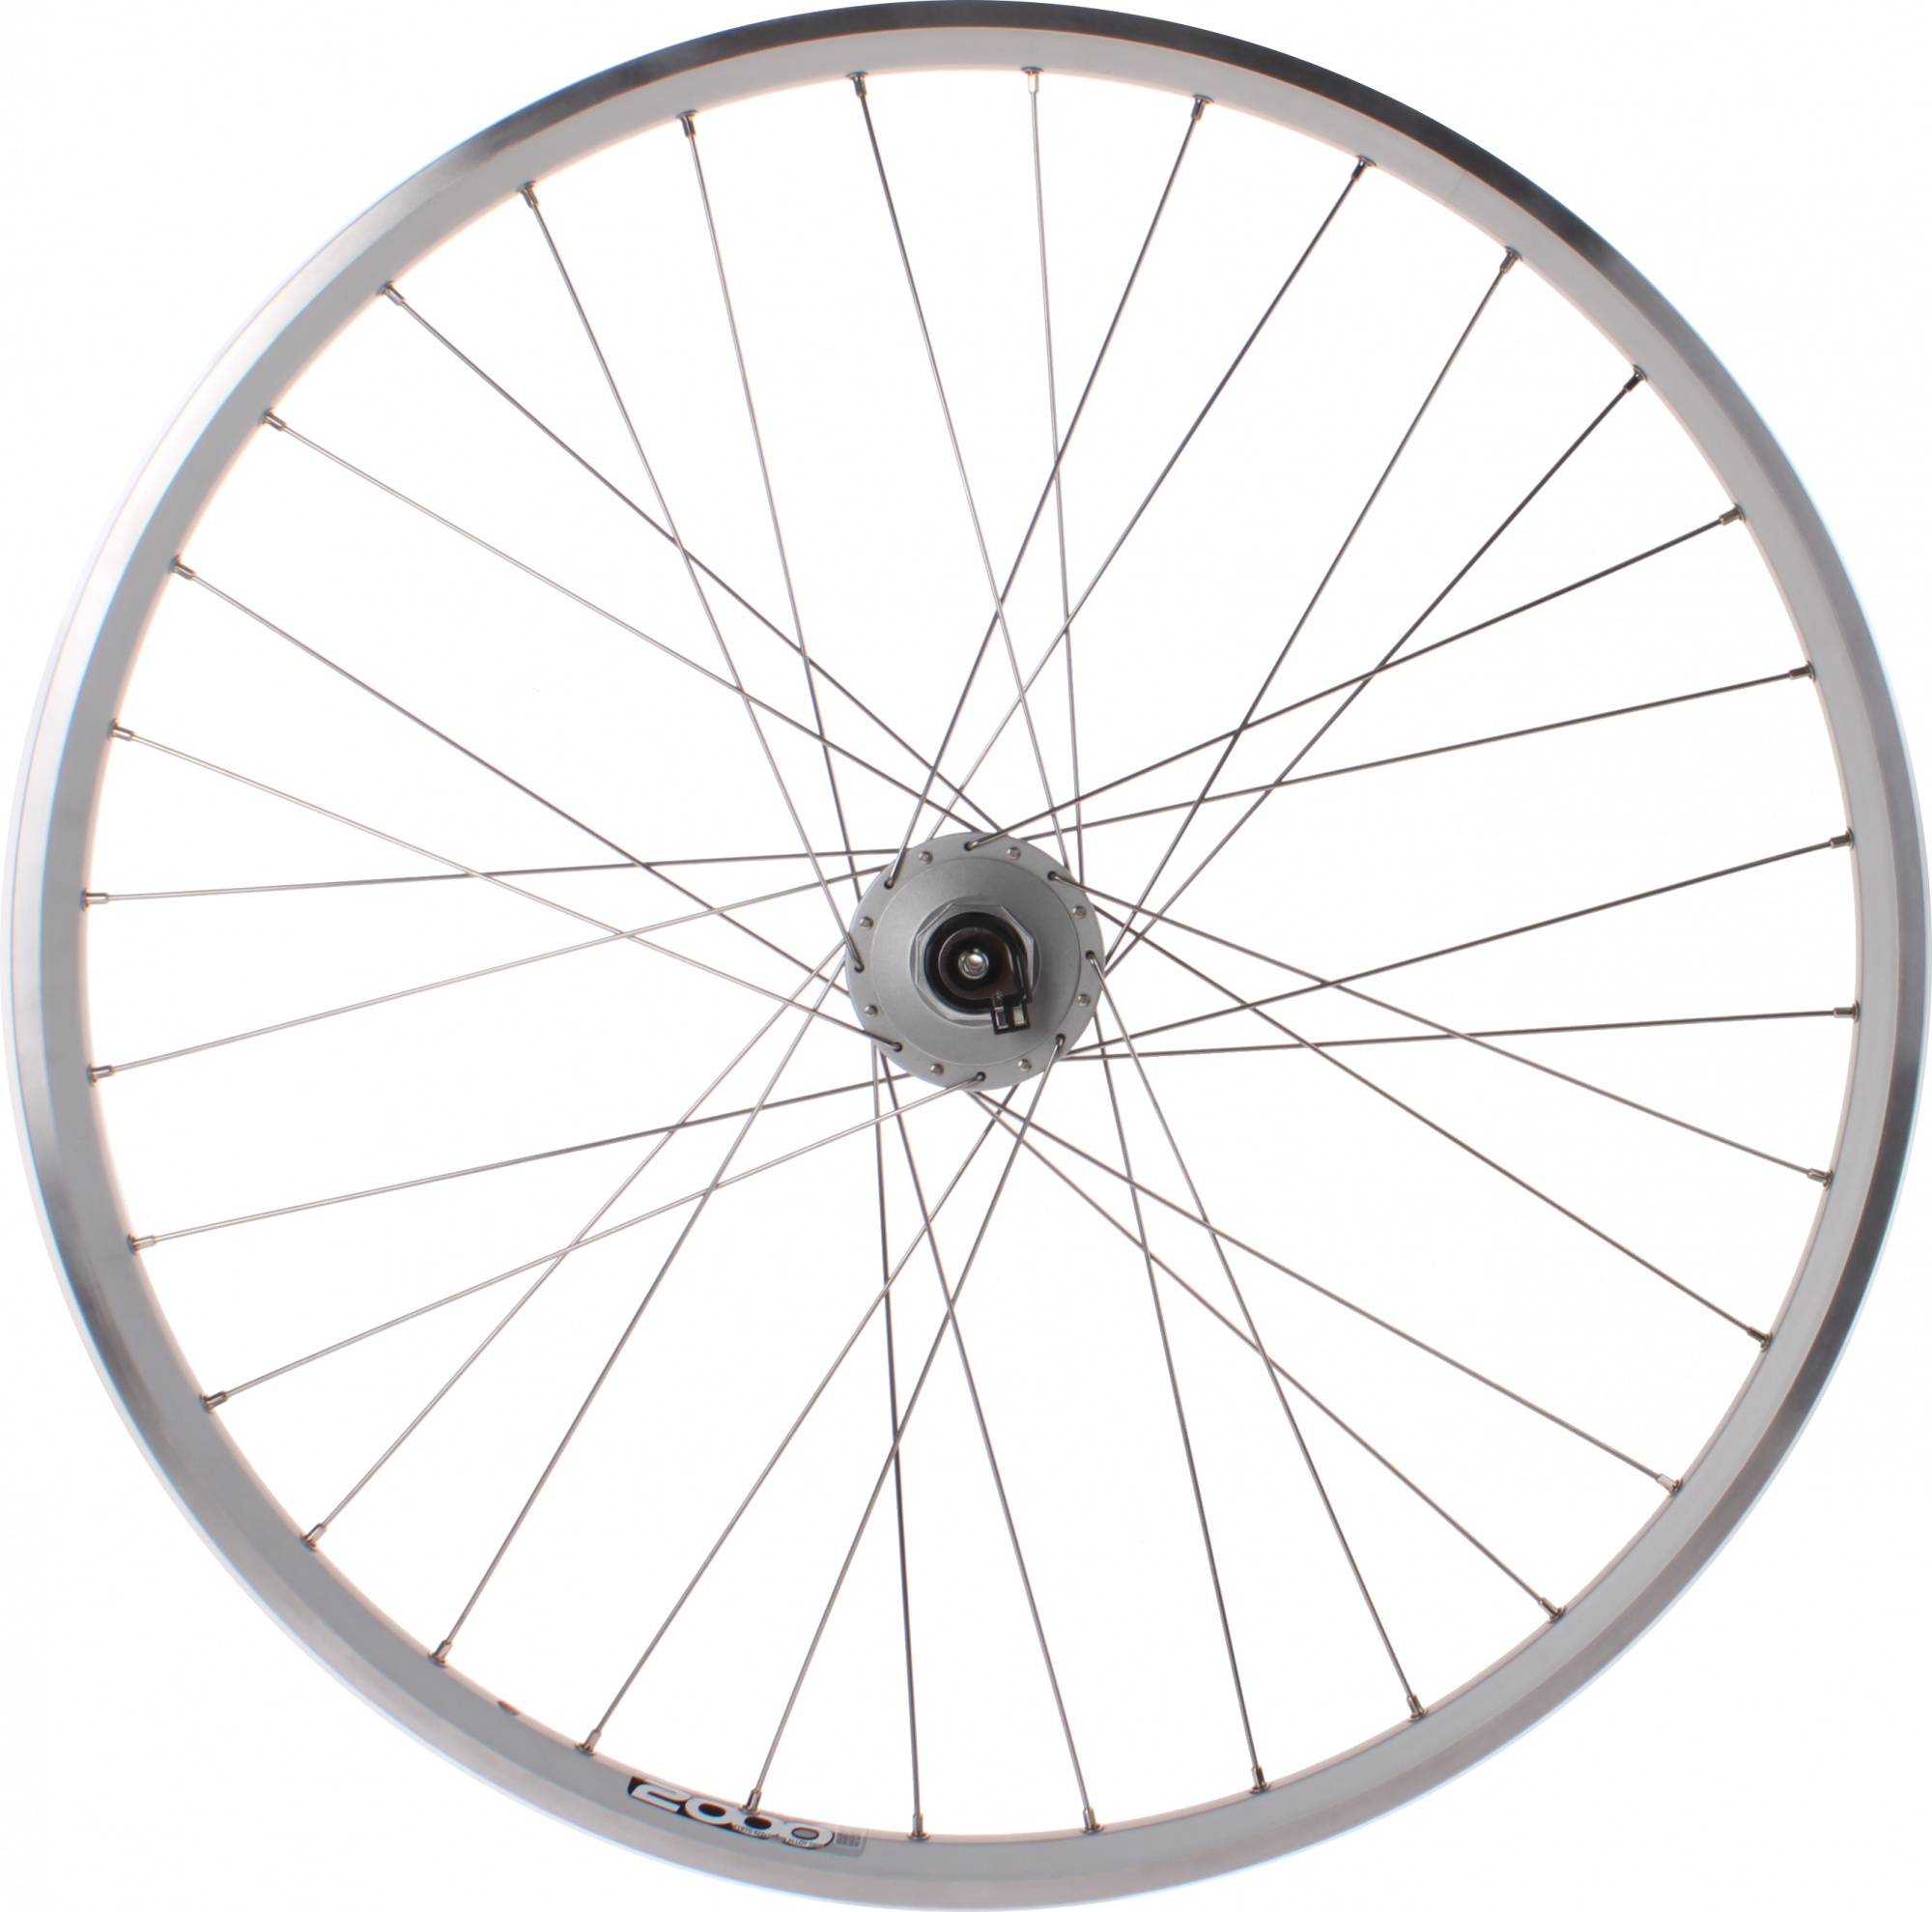 Stem At Ryde Academy Rydestem: Ryde Front Wheel Zac 2000 28 Inch Disc Brake 32G Aluminum